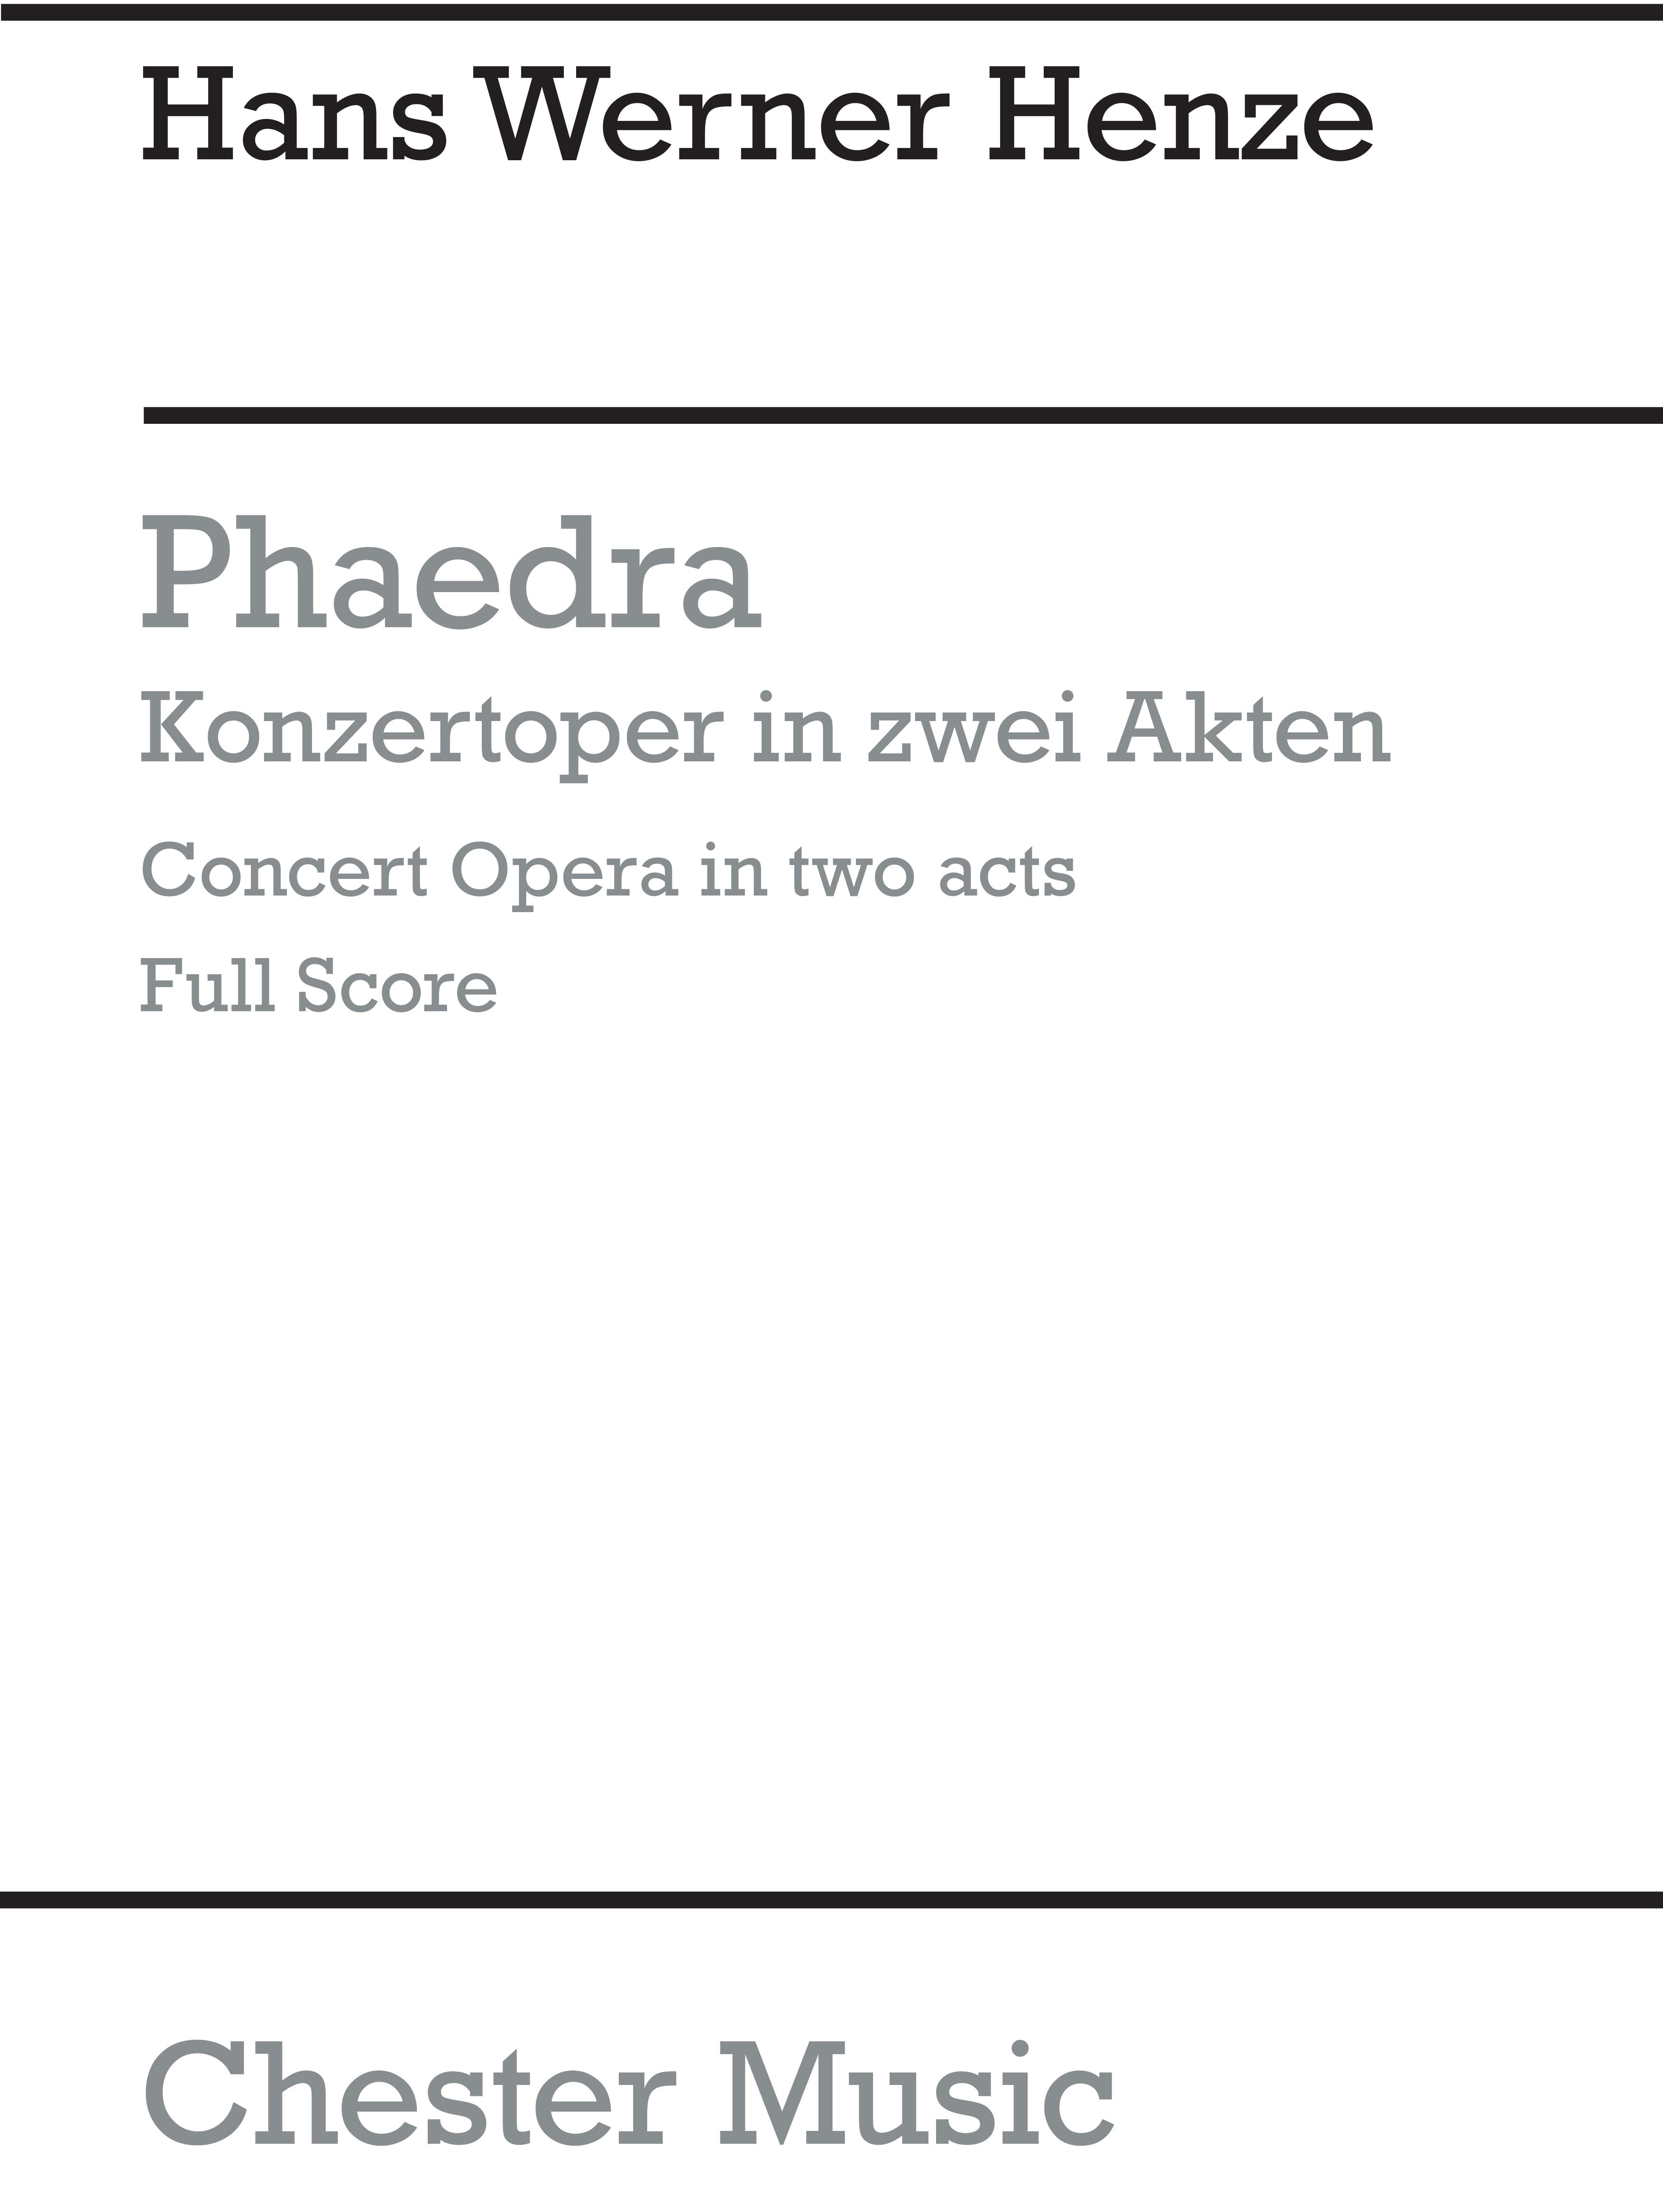 Hans Werner Henze: Phaedra: Opera: Score